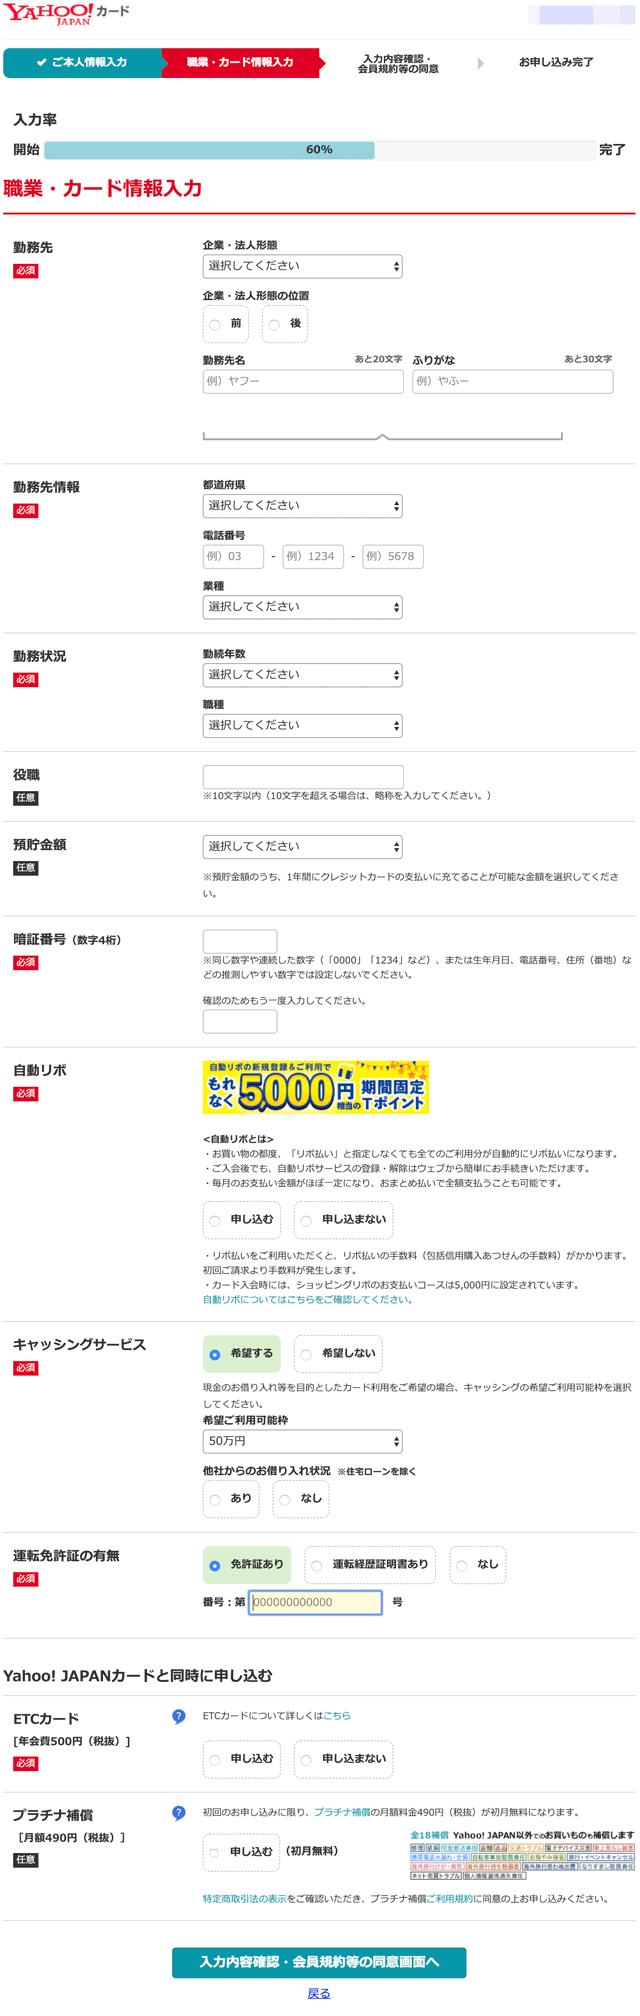 Yahoo! JAPANカード申し込みに必要な職業情報入力画面